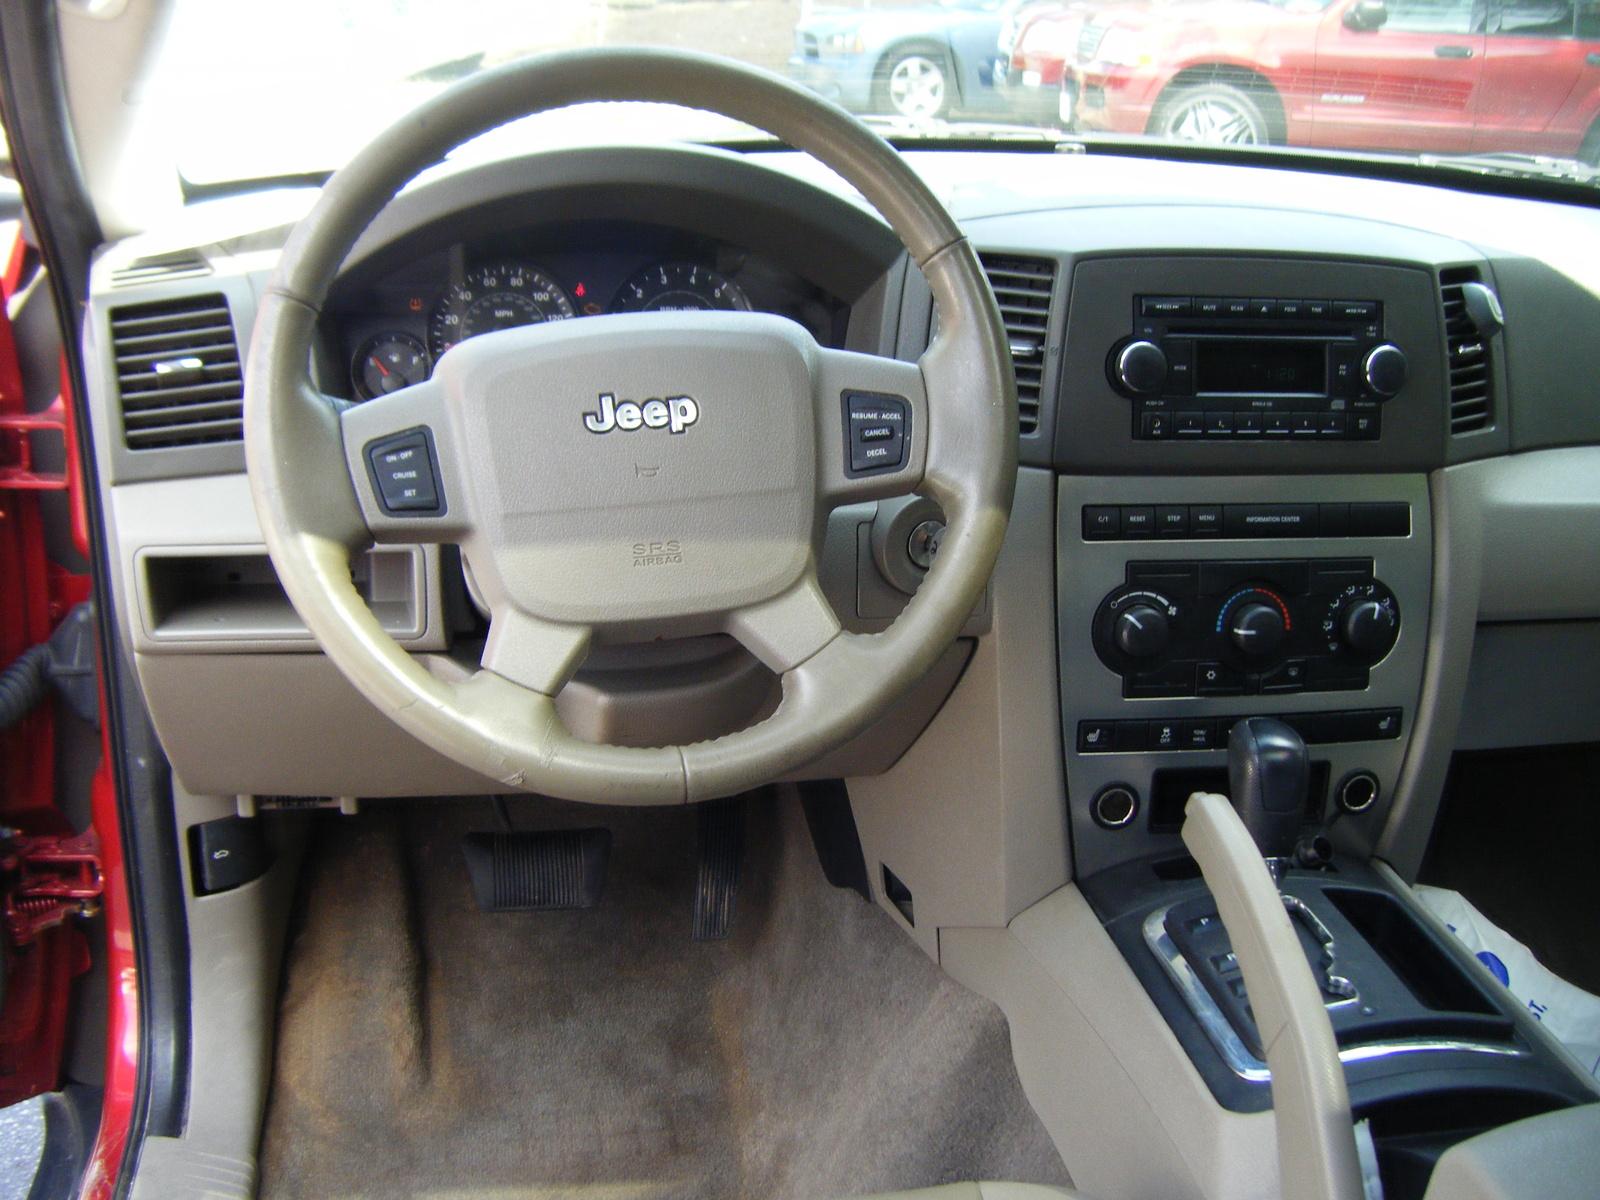 2006 Jeep Grand Cherokee Interior Related Keywords 2006 Jeep Grand Cherokee Interior Long Tail